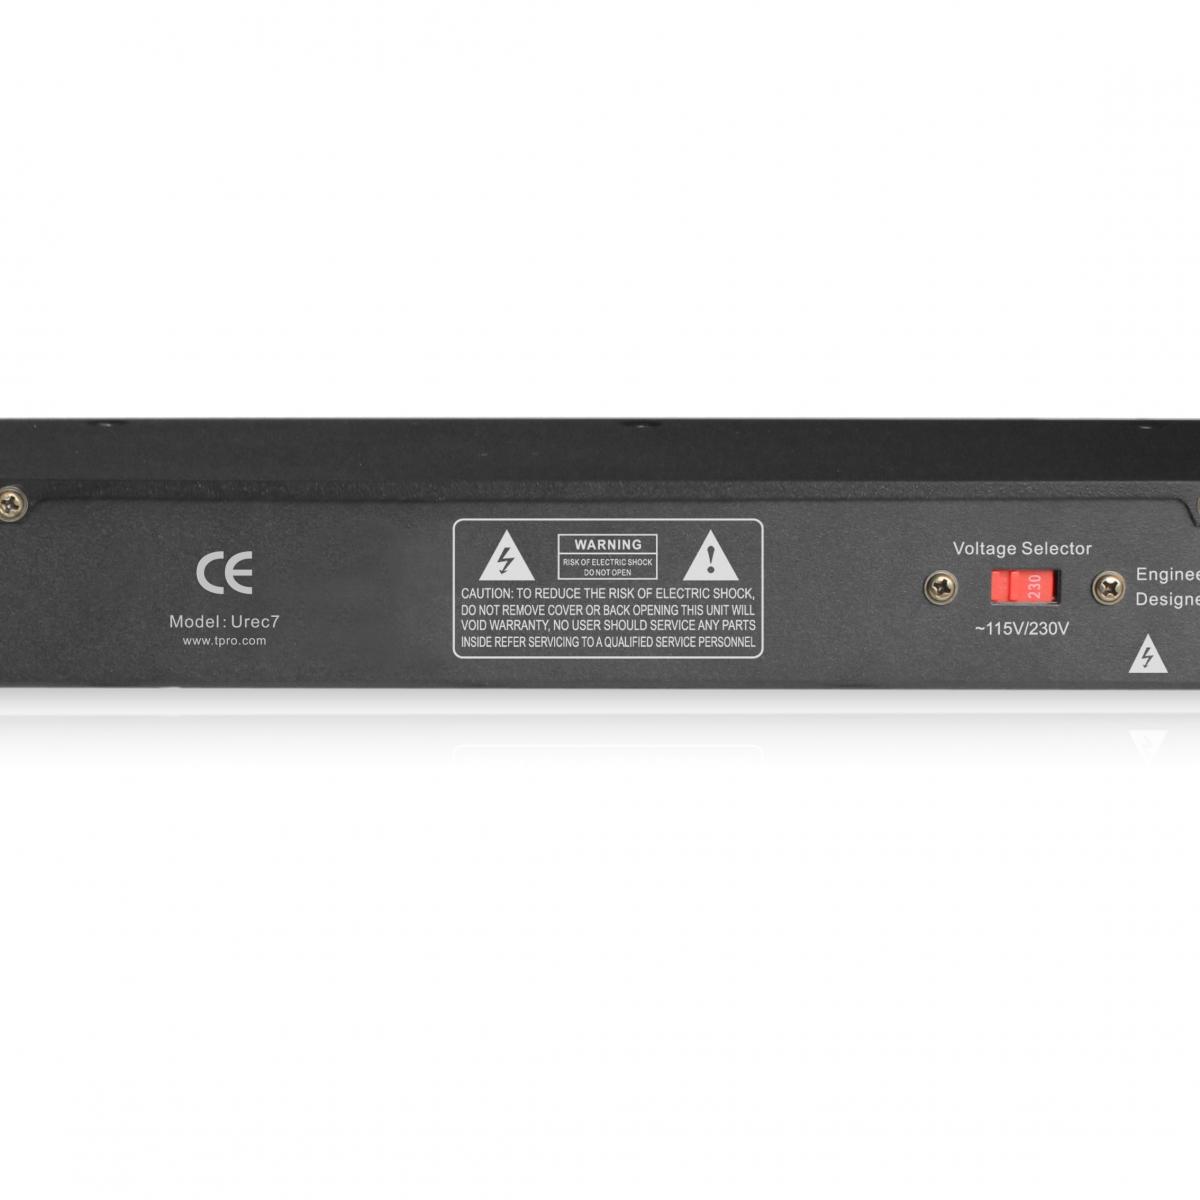 Urec7 Usb Sd Recorder Dj Equipment Music Trends Gear Long Flashdisk Card 8 Gb